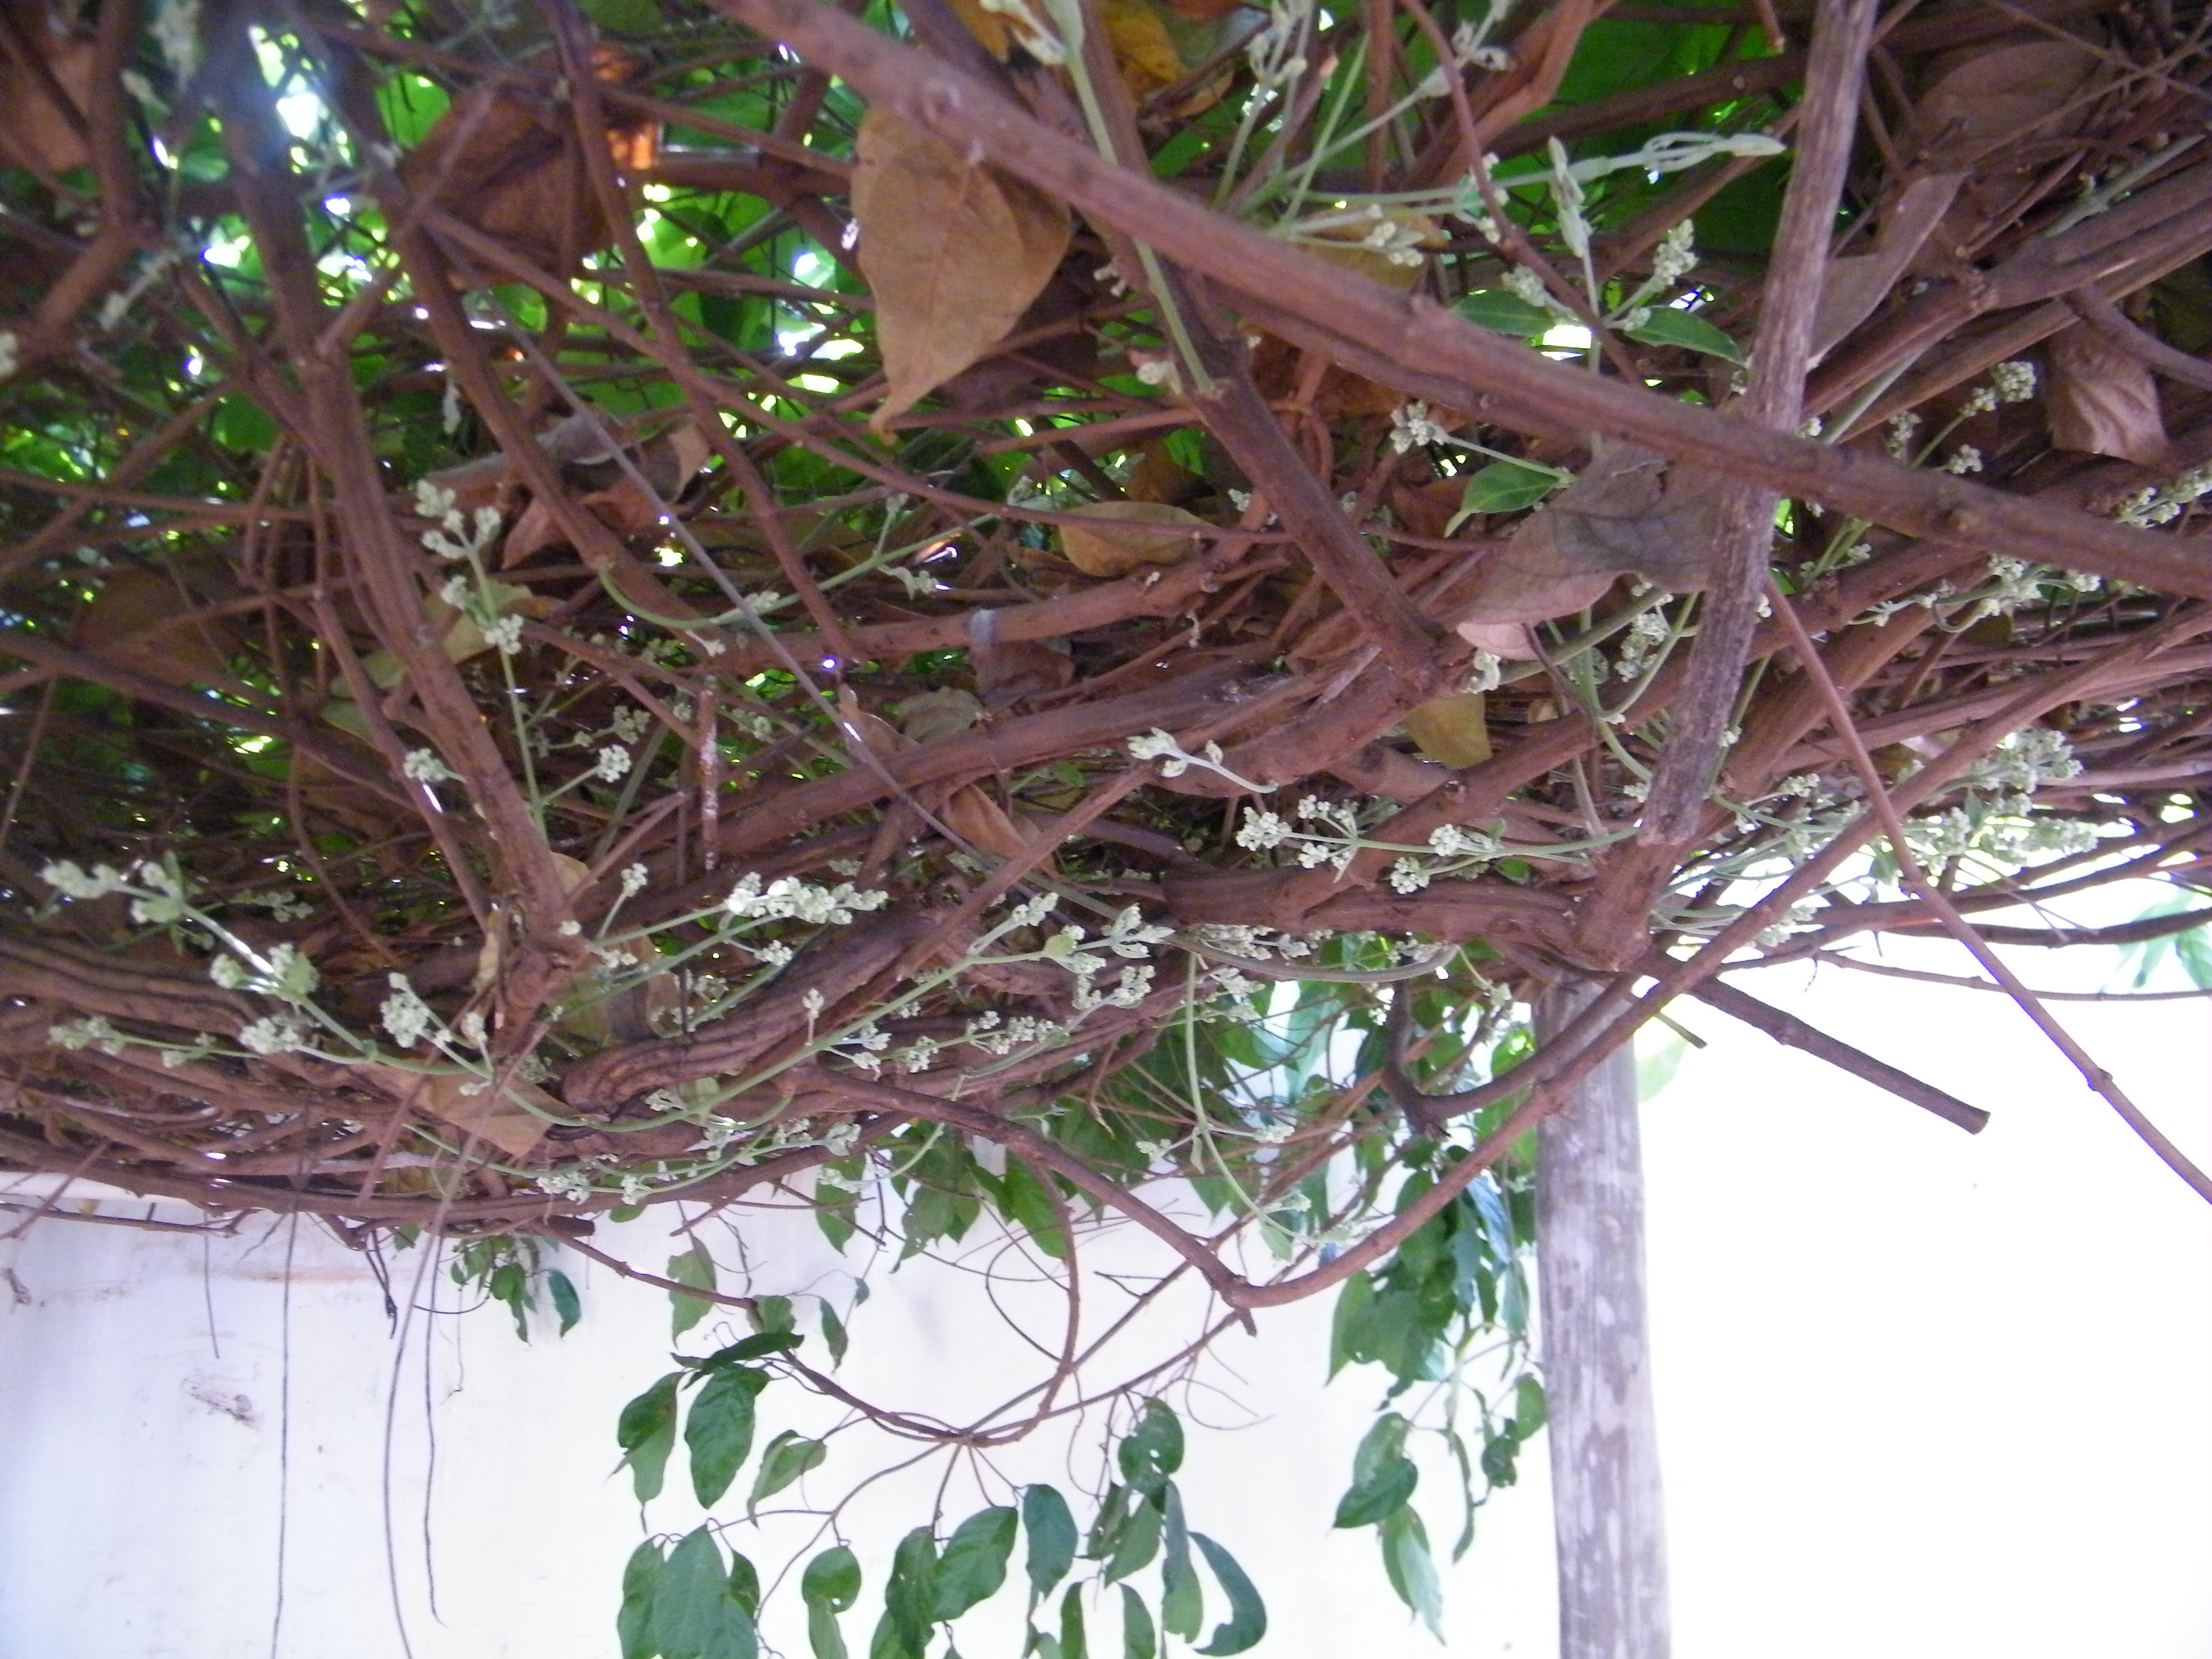 Florada Julho 2015 - 03.JPG